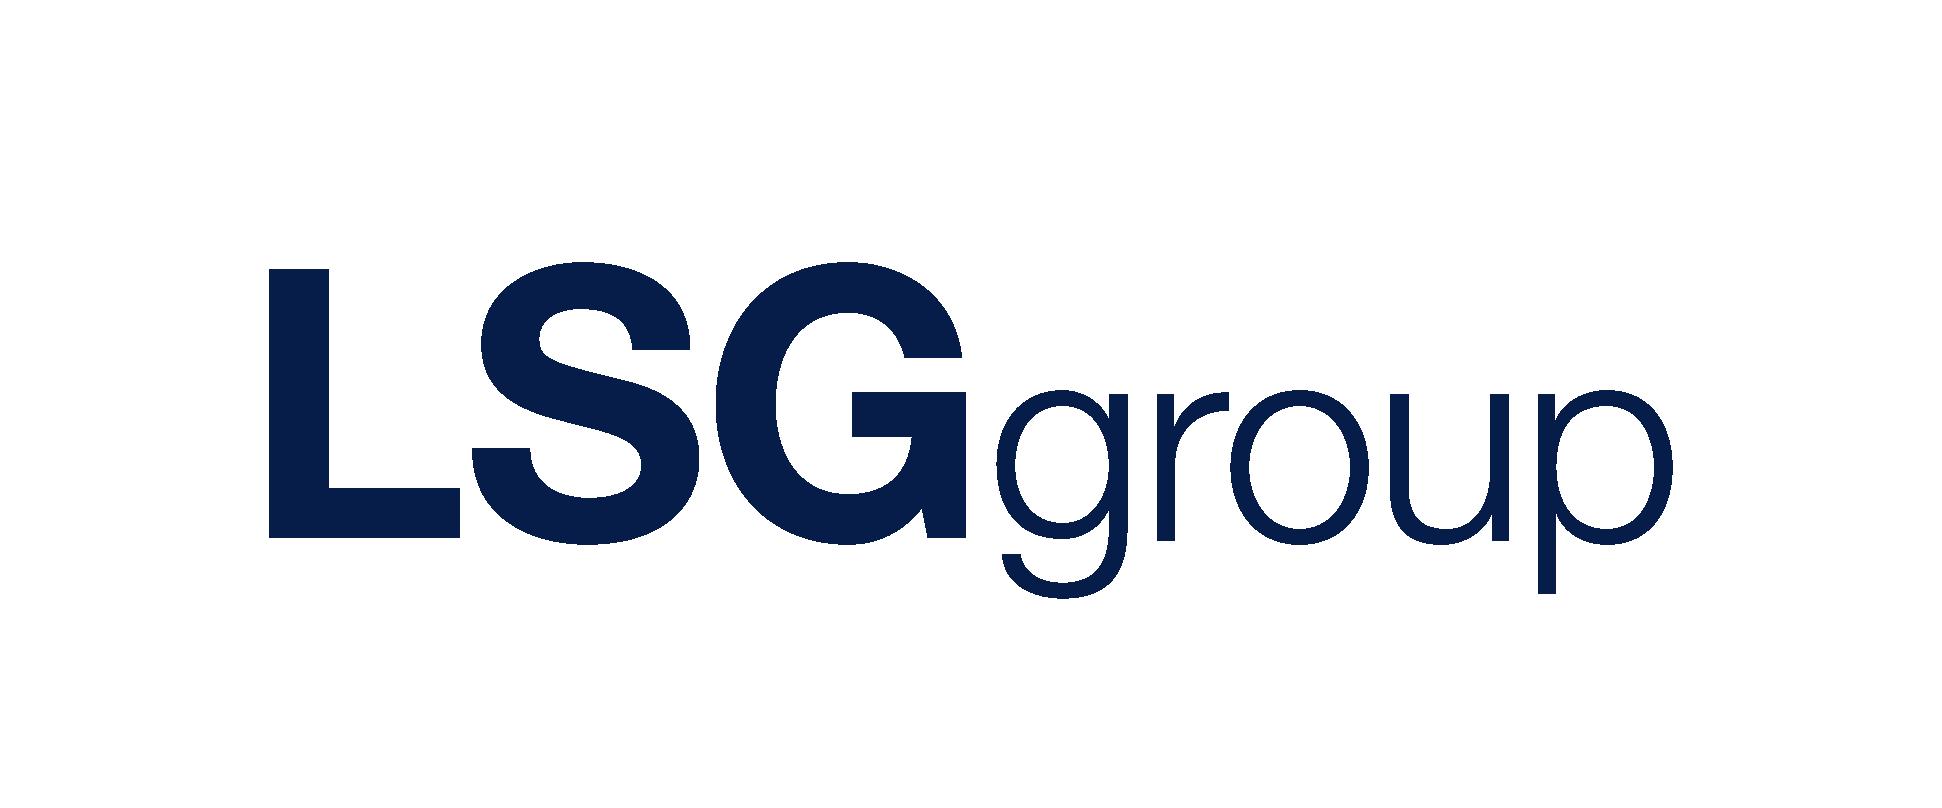 LSG Sky Chefs - Wikipedia